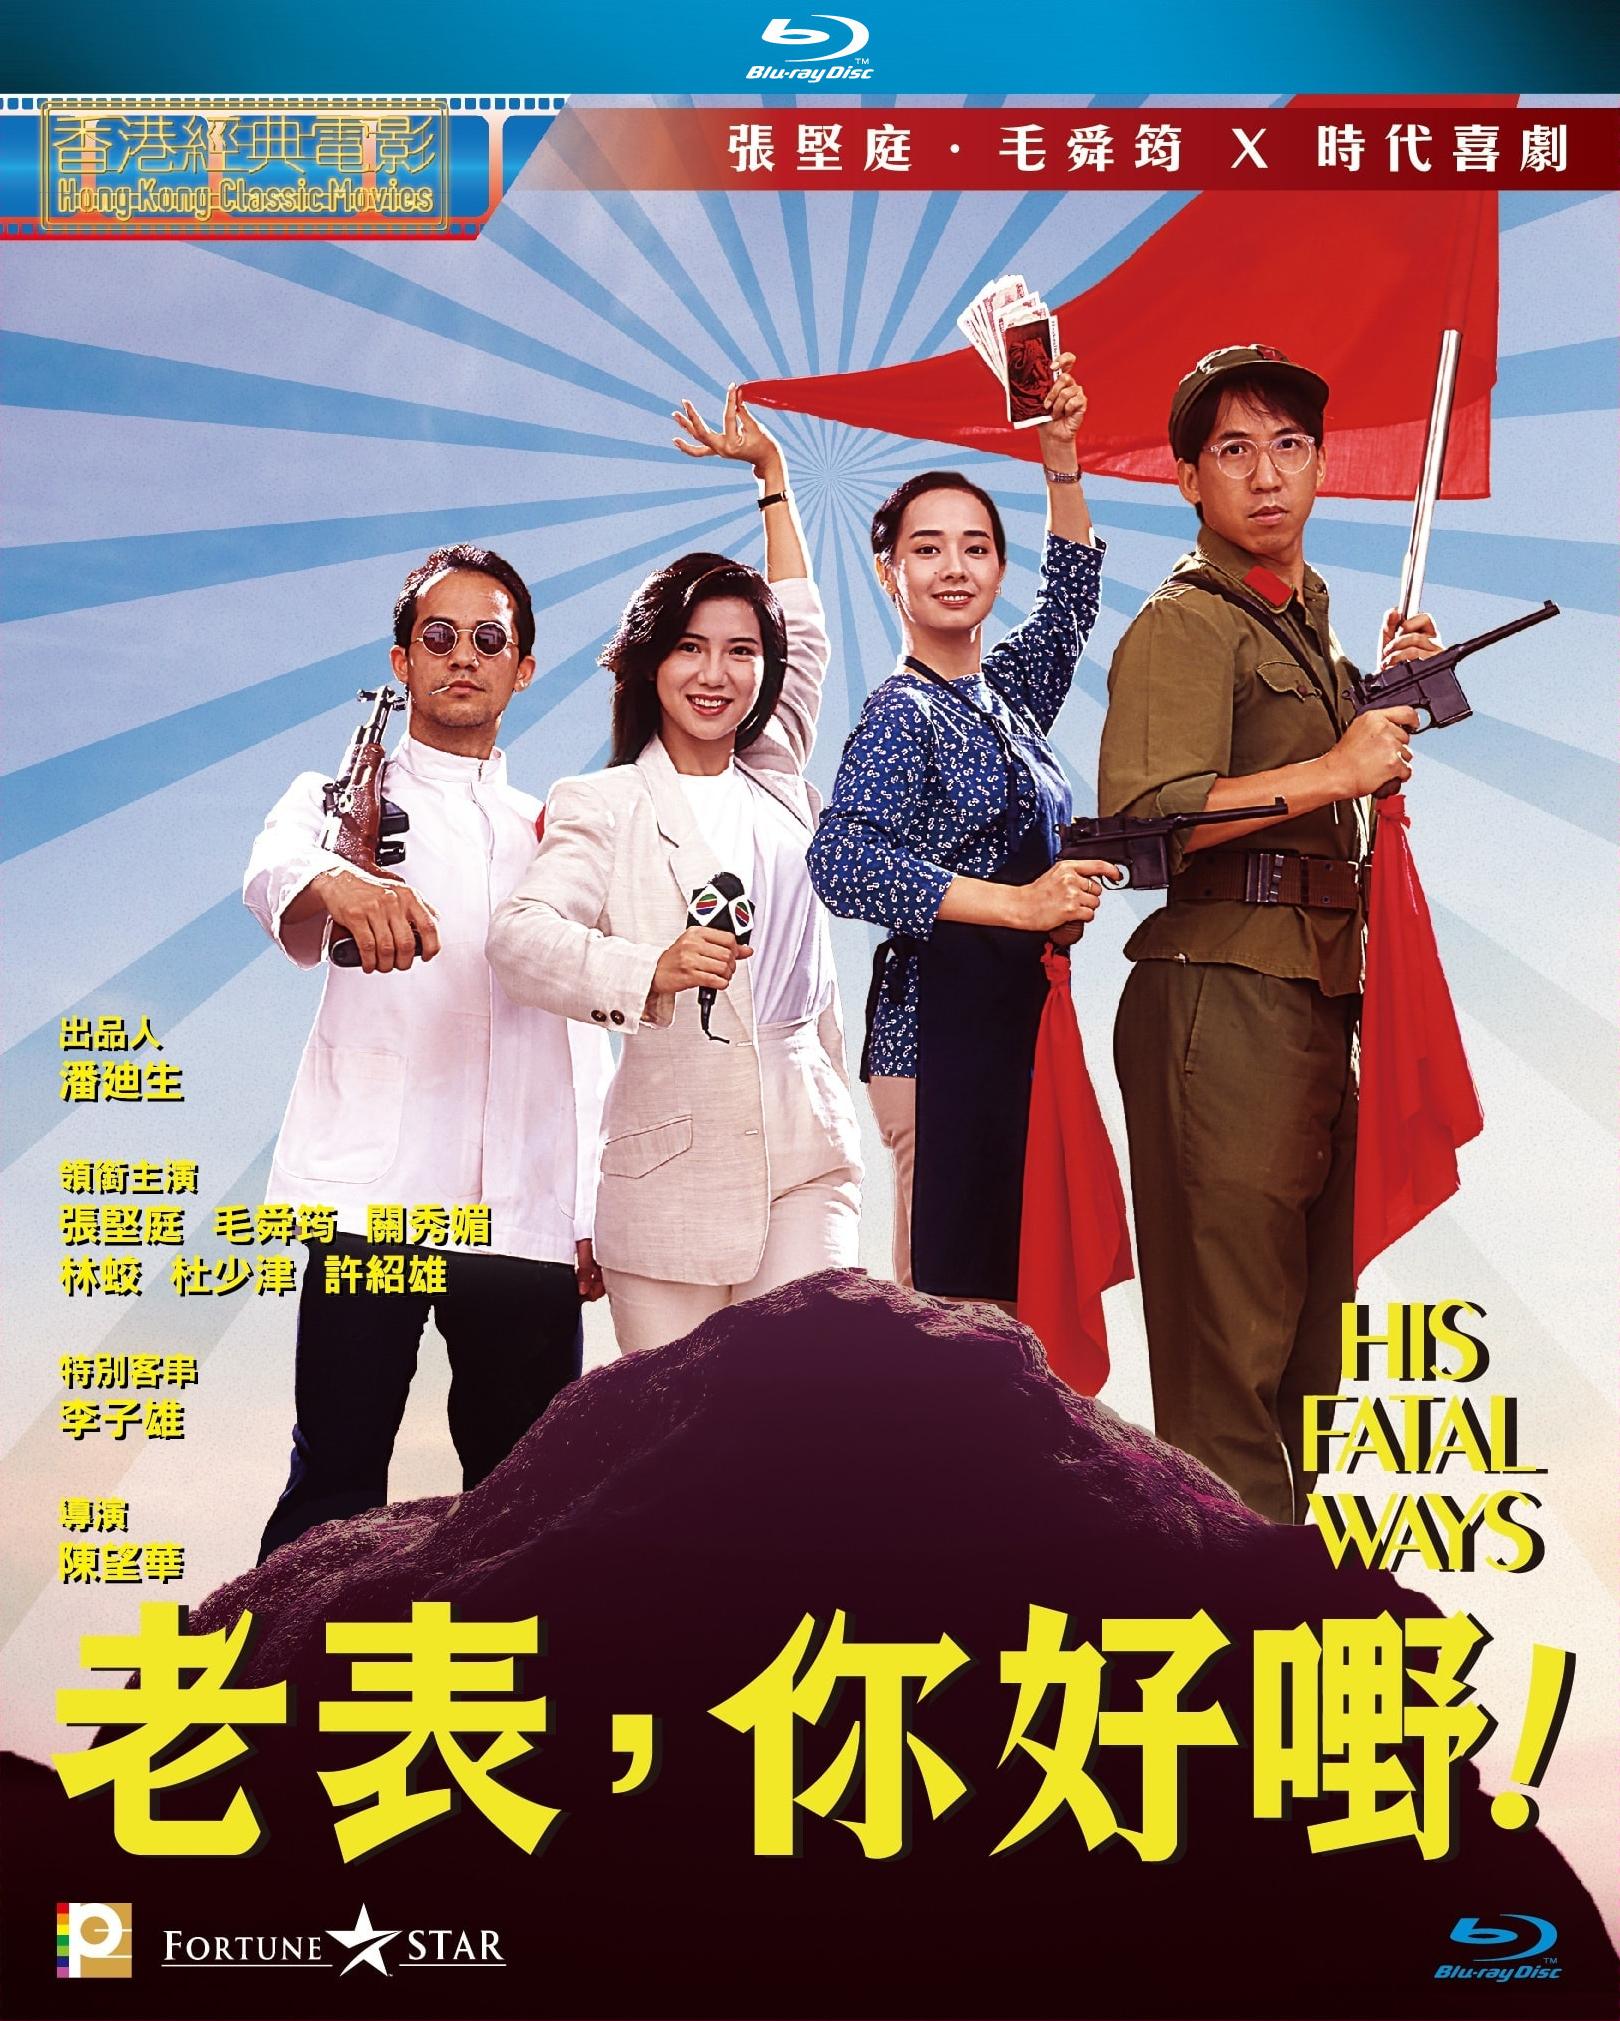 老表,你好嘢! 國粵雙語 原盤繁簡英SUP字幕 His Fatal Ways 1991 BluRay 1080p 2Audio DTS-HD MA 2.0 x265.10bit-BeiTai